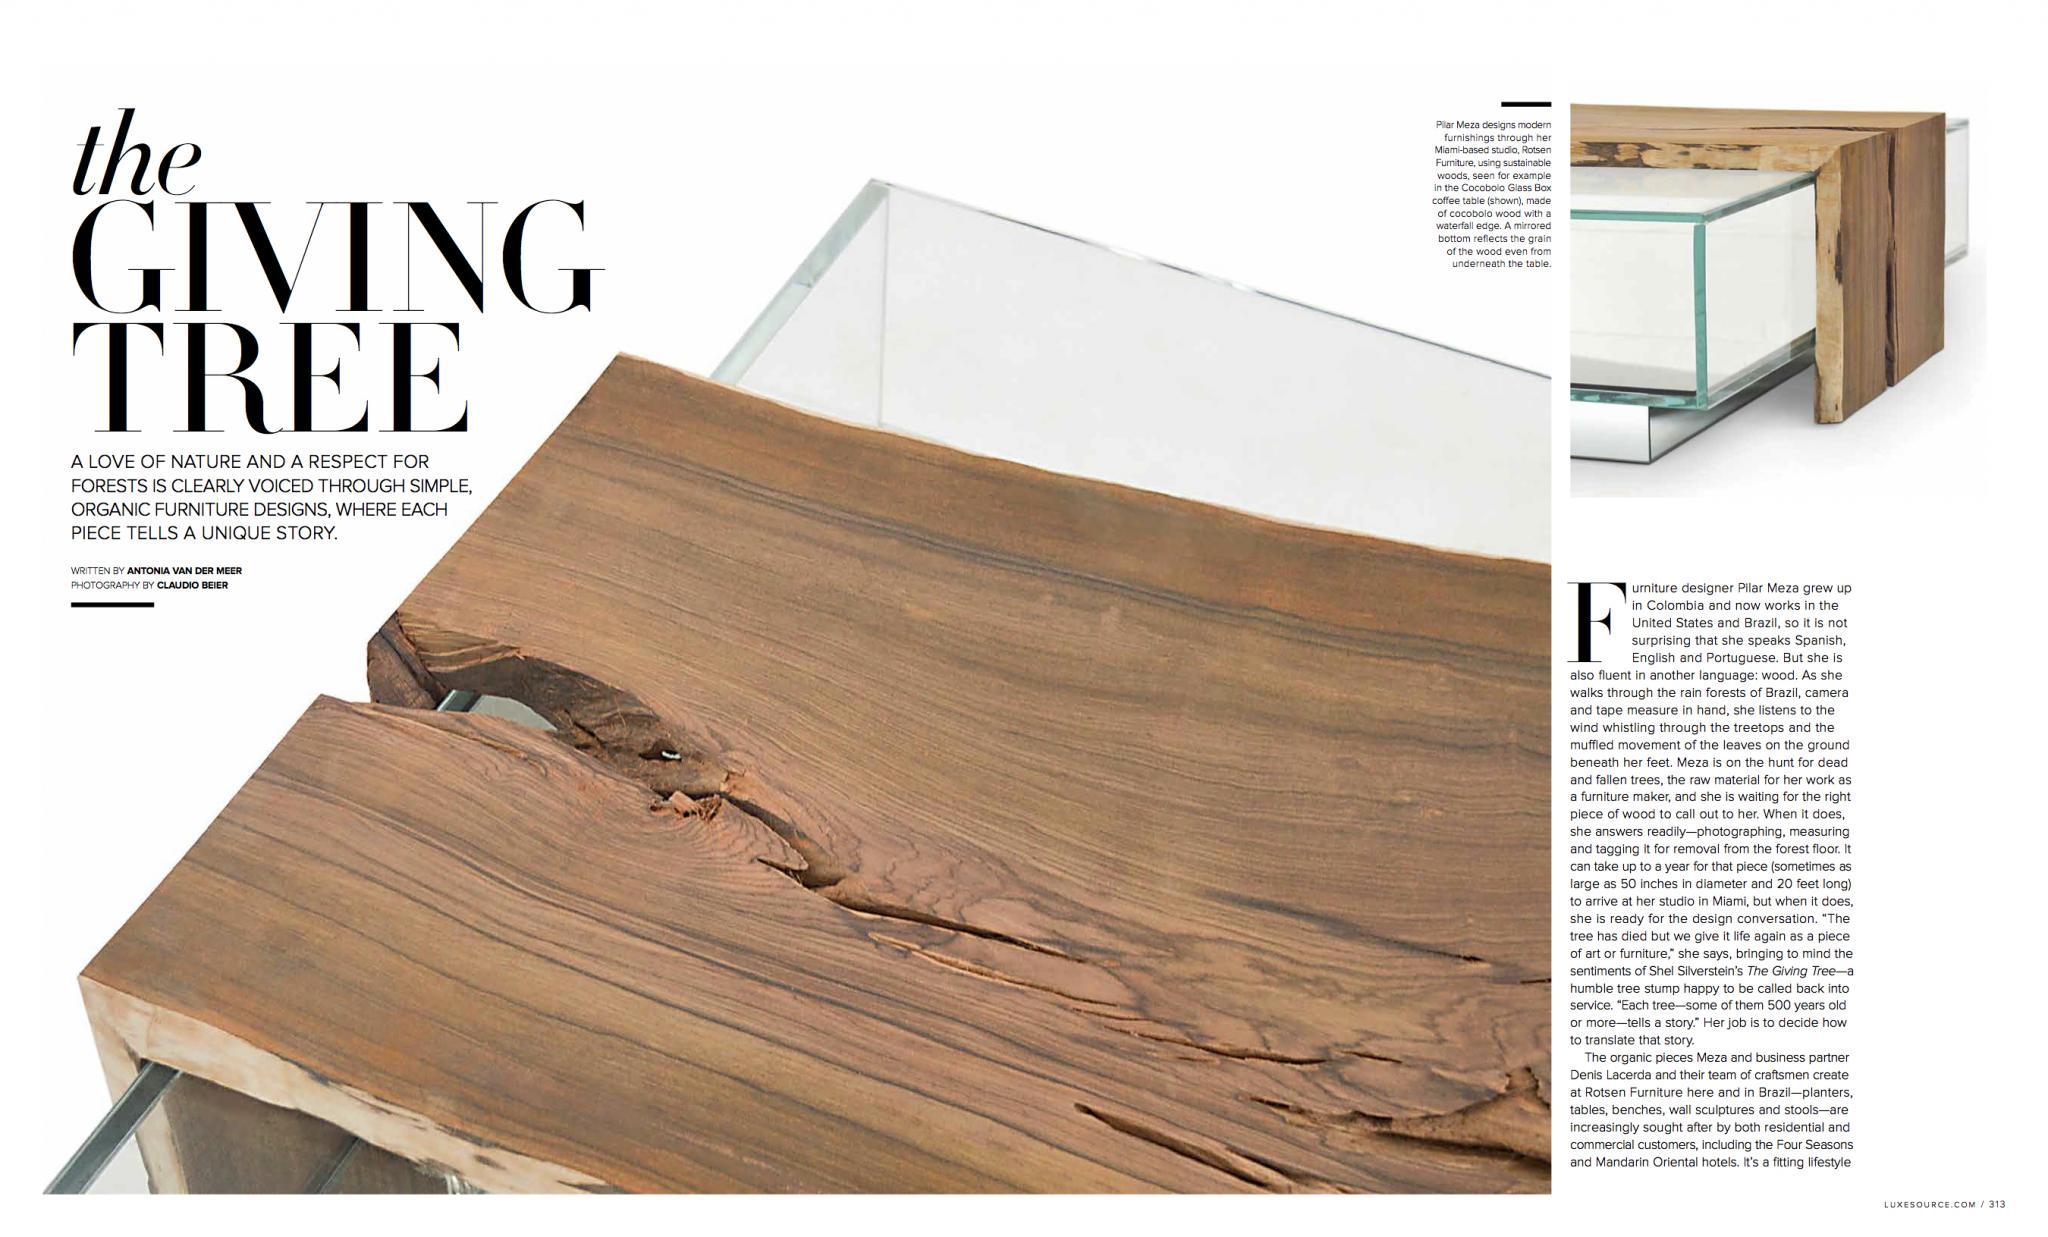 Miami design Magazine - Rotsen Furniture